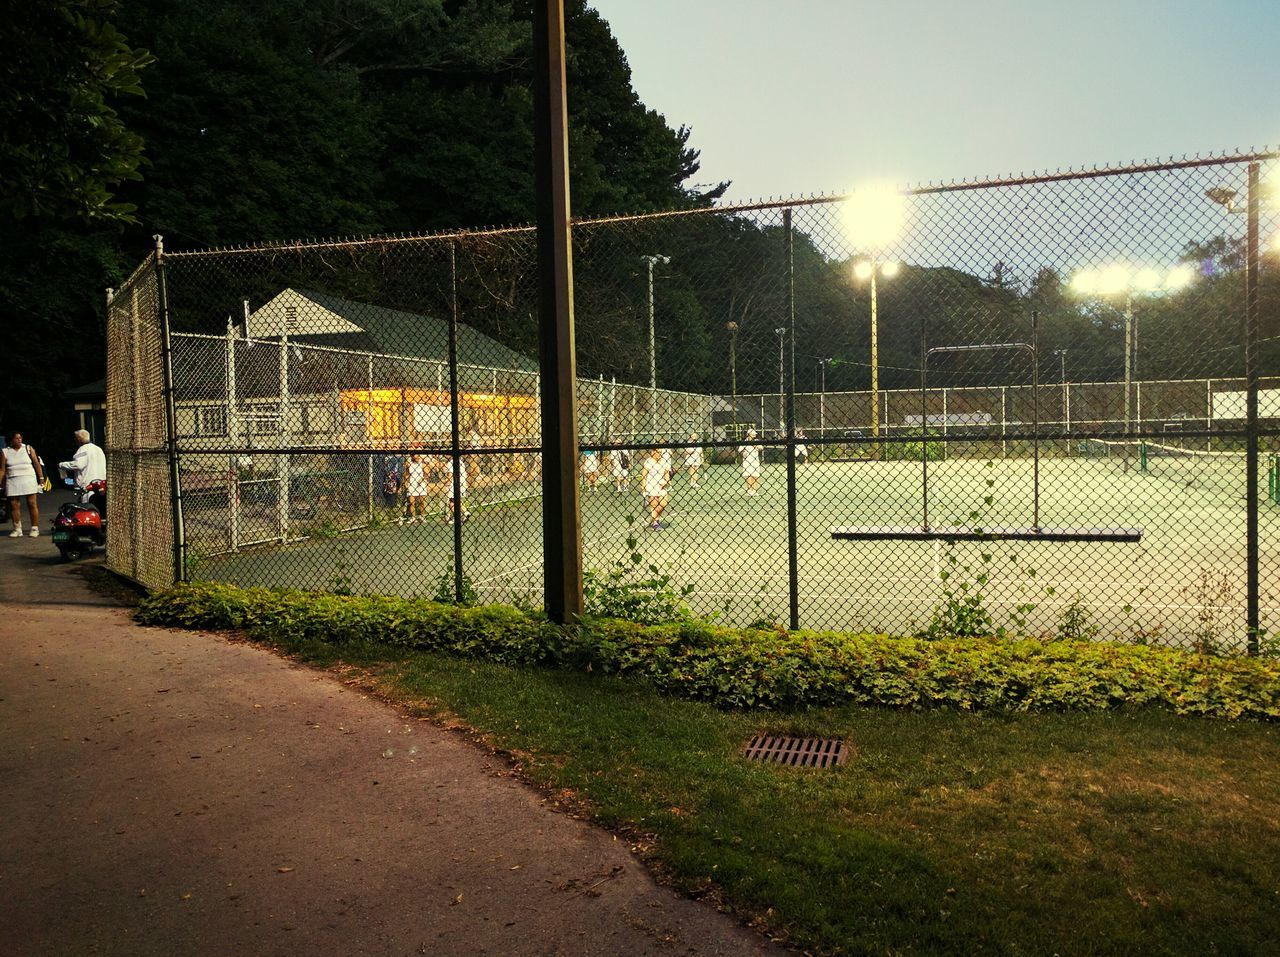 Night Time Tennis Spot Light  Fitness Tennis 🎾 Senior Fitness Dusk At Lawrence Park